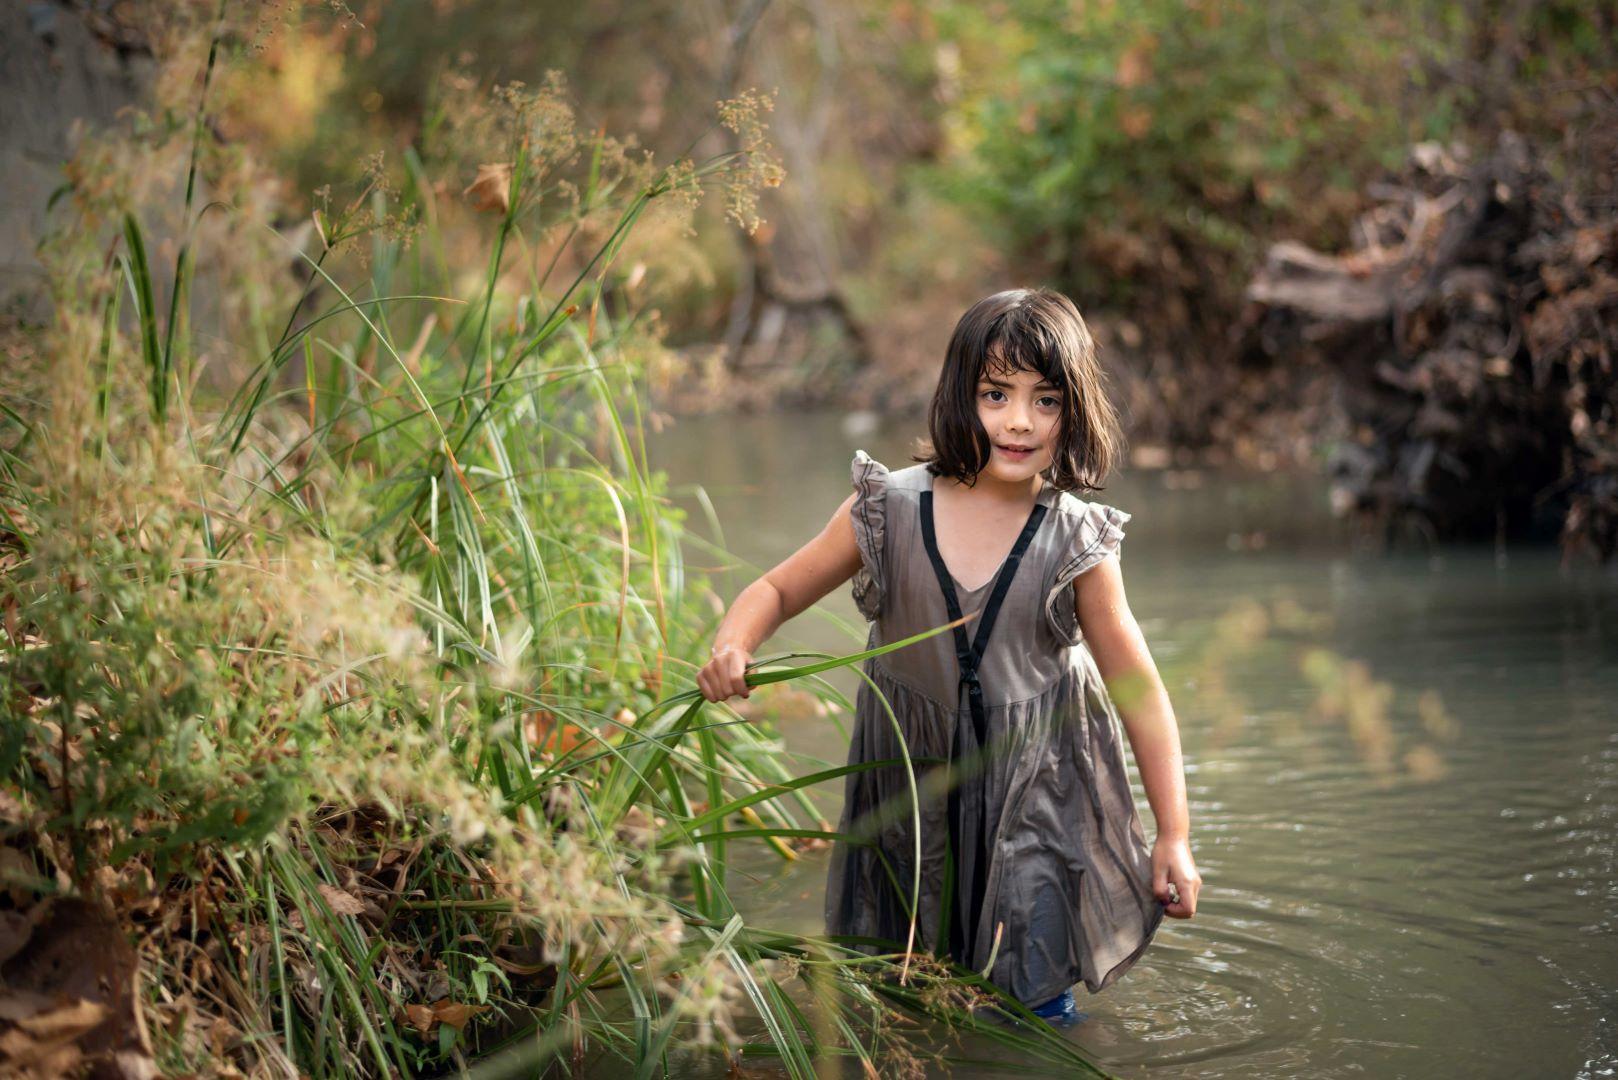 neilson kids family photography cupertino mcclellan park creek orla water